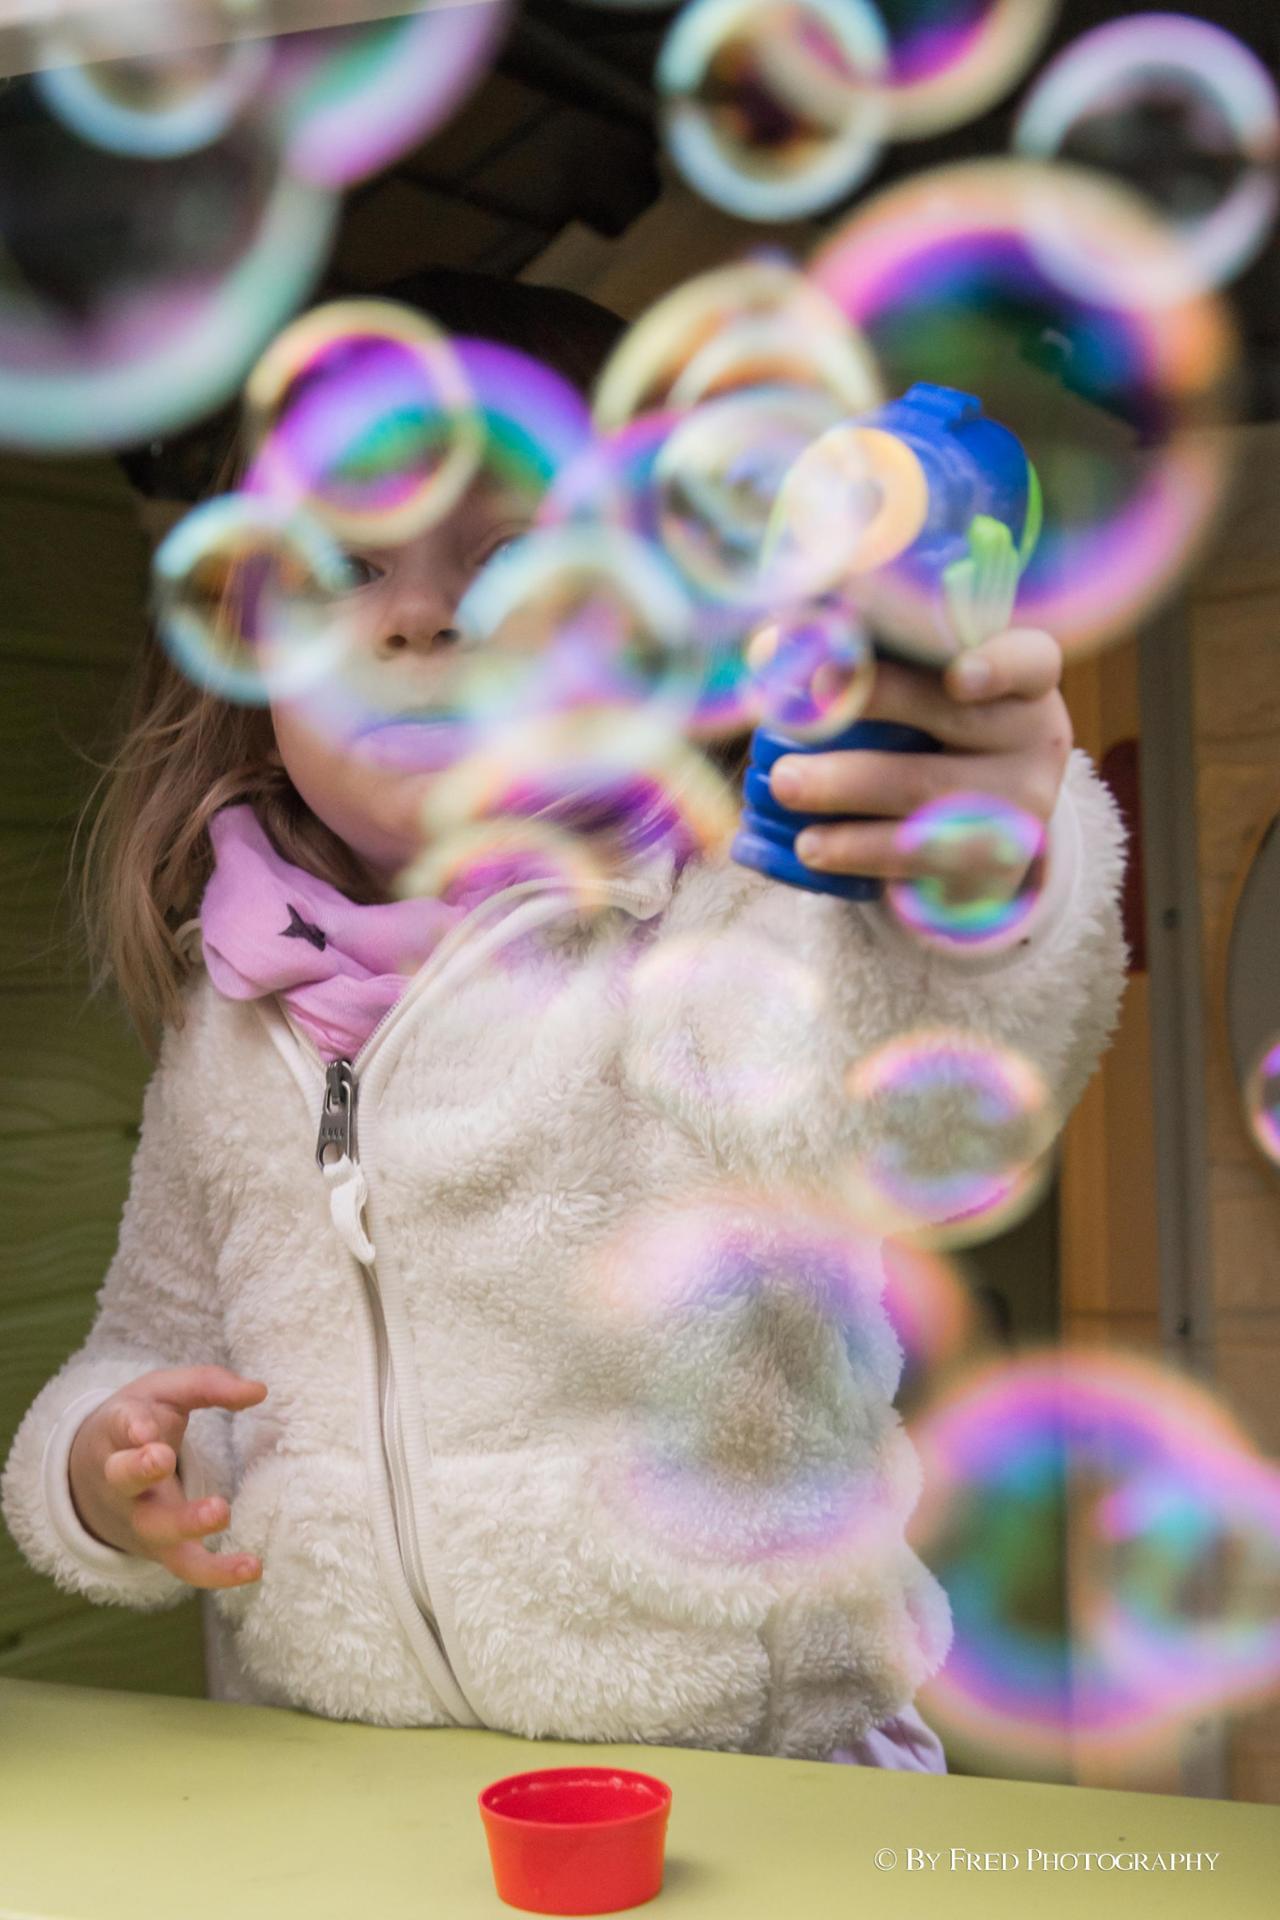 Dans mes bulles...